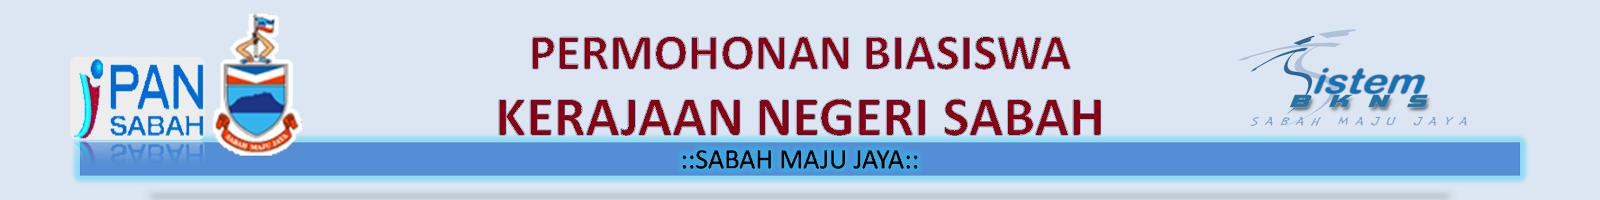 permohonan BKNS 2015